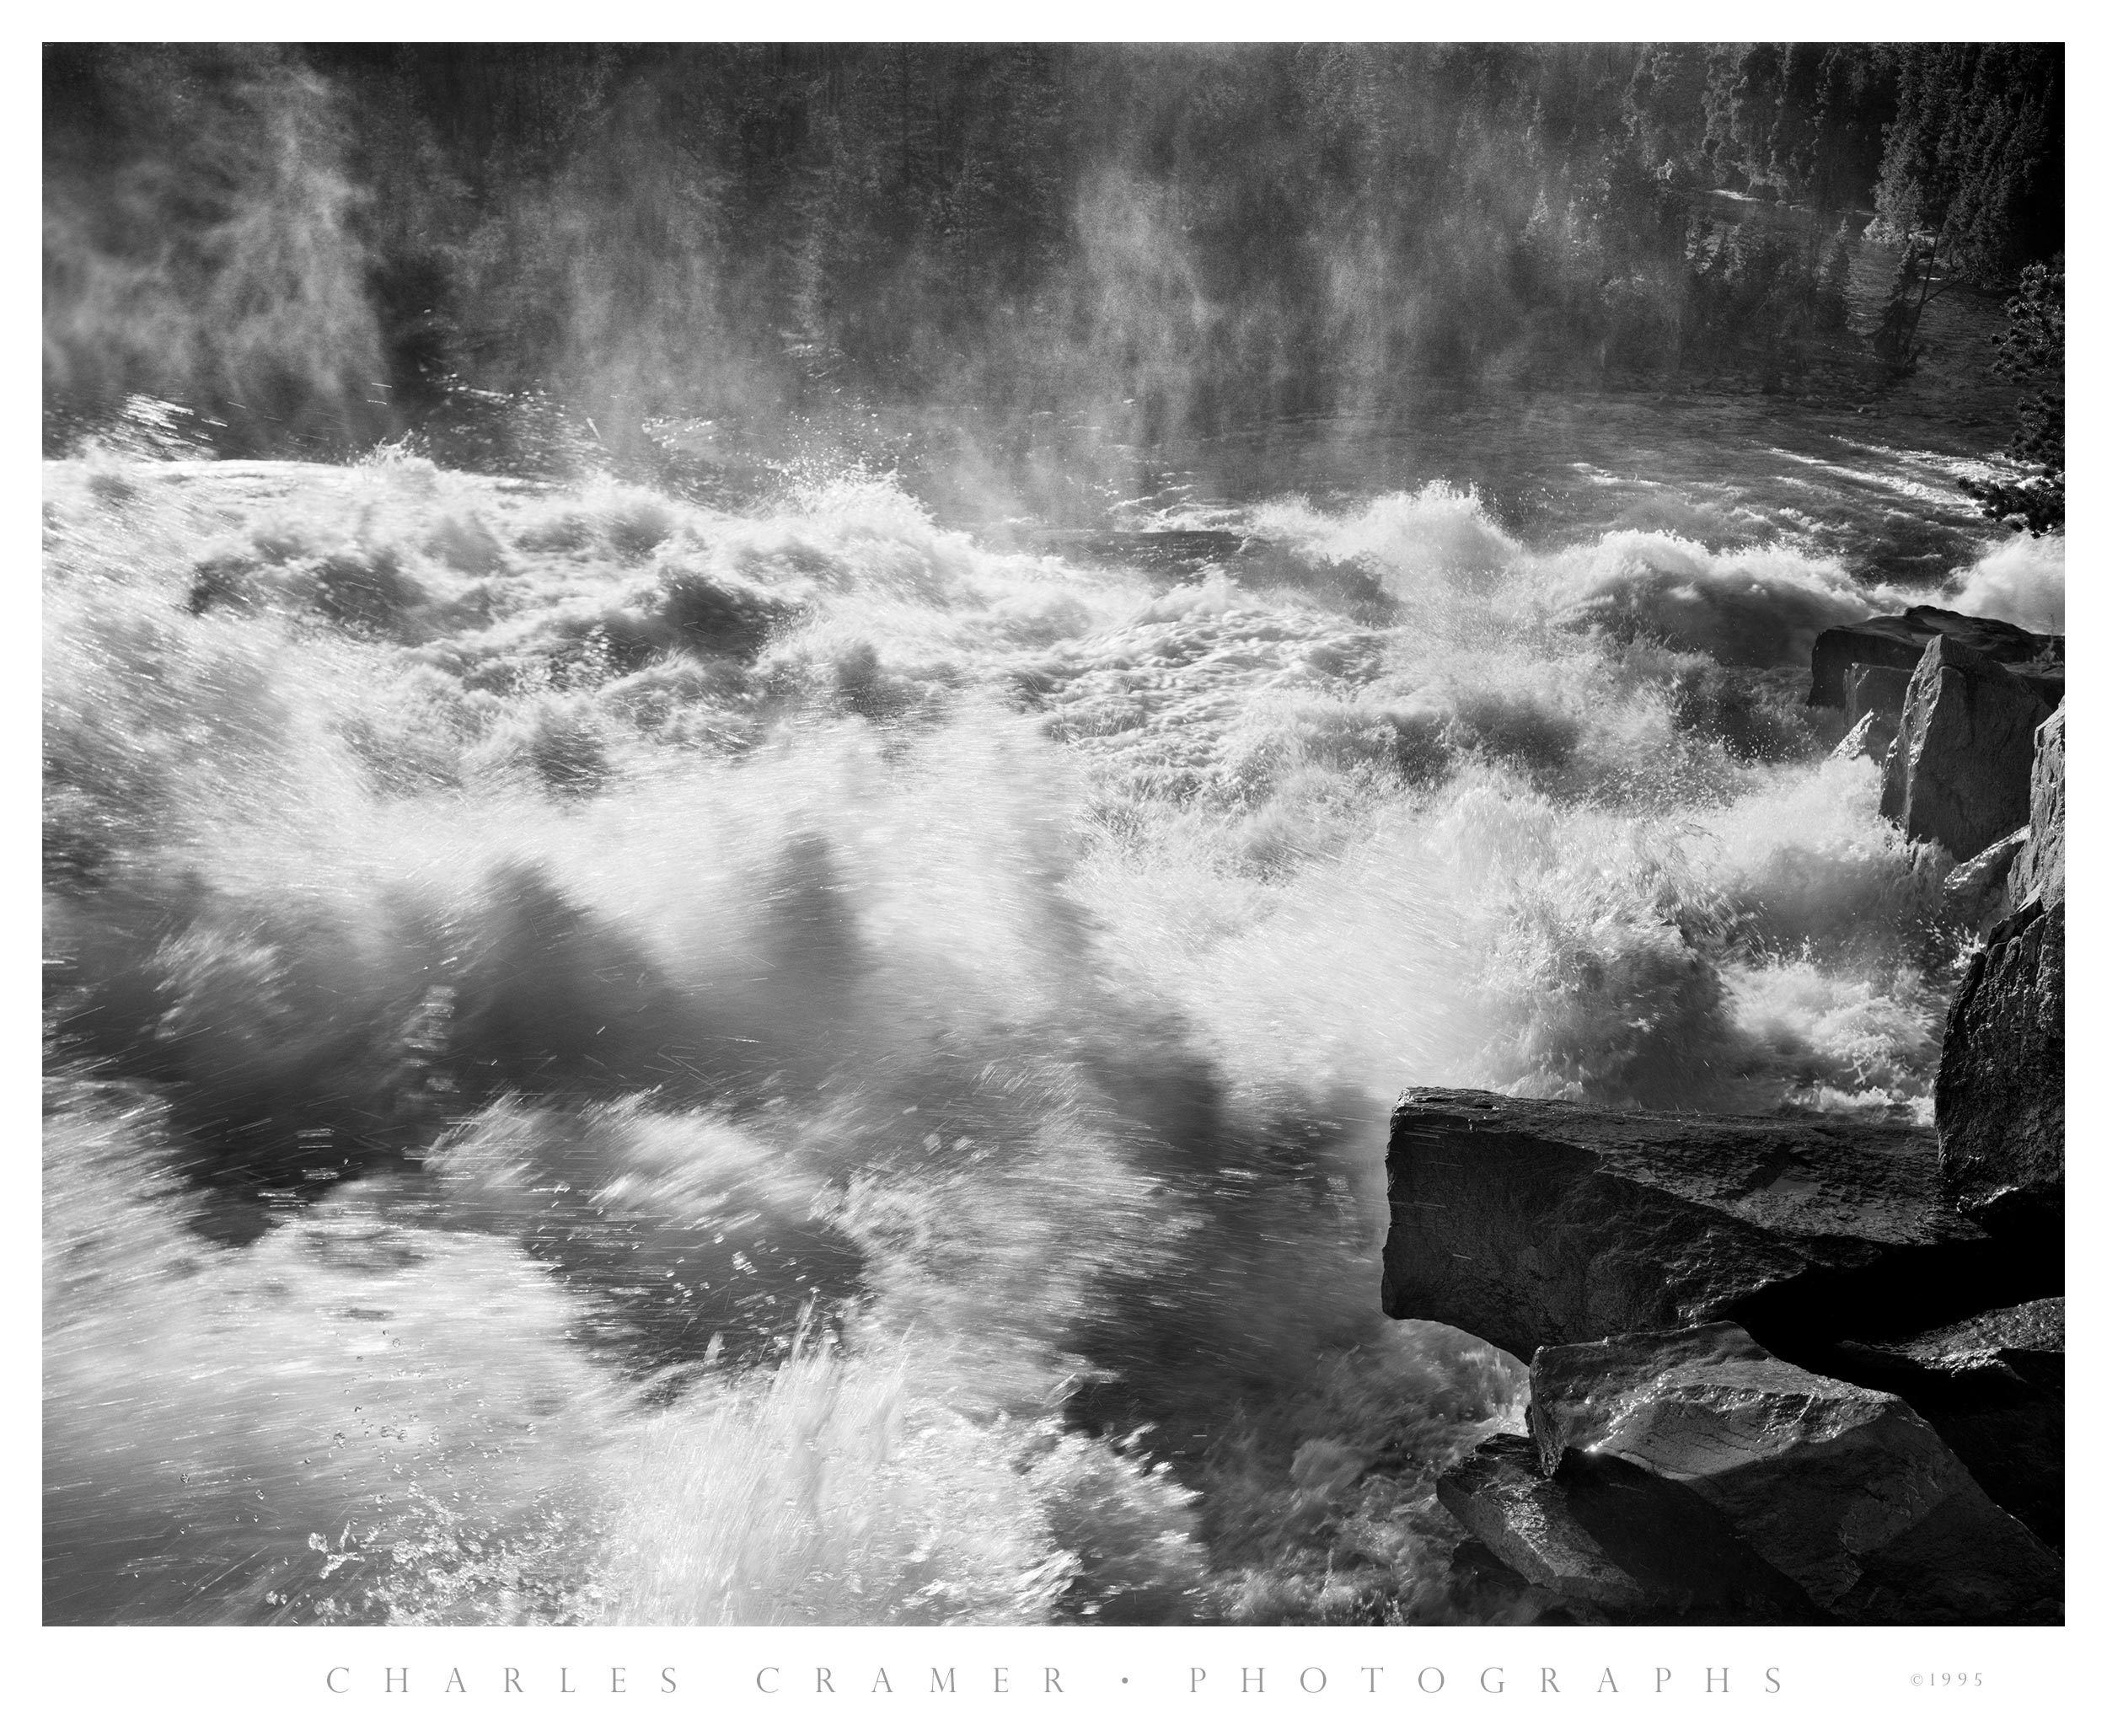 Spring Flood, Tuolumne River, Glen Aulin, Yosemite